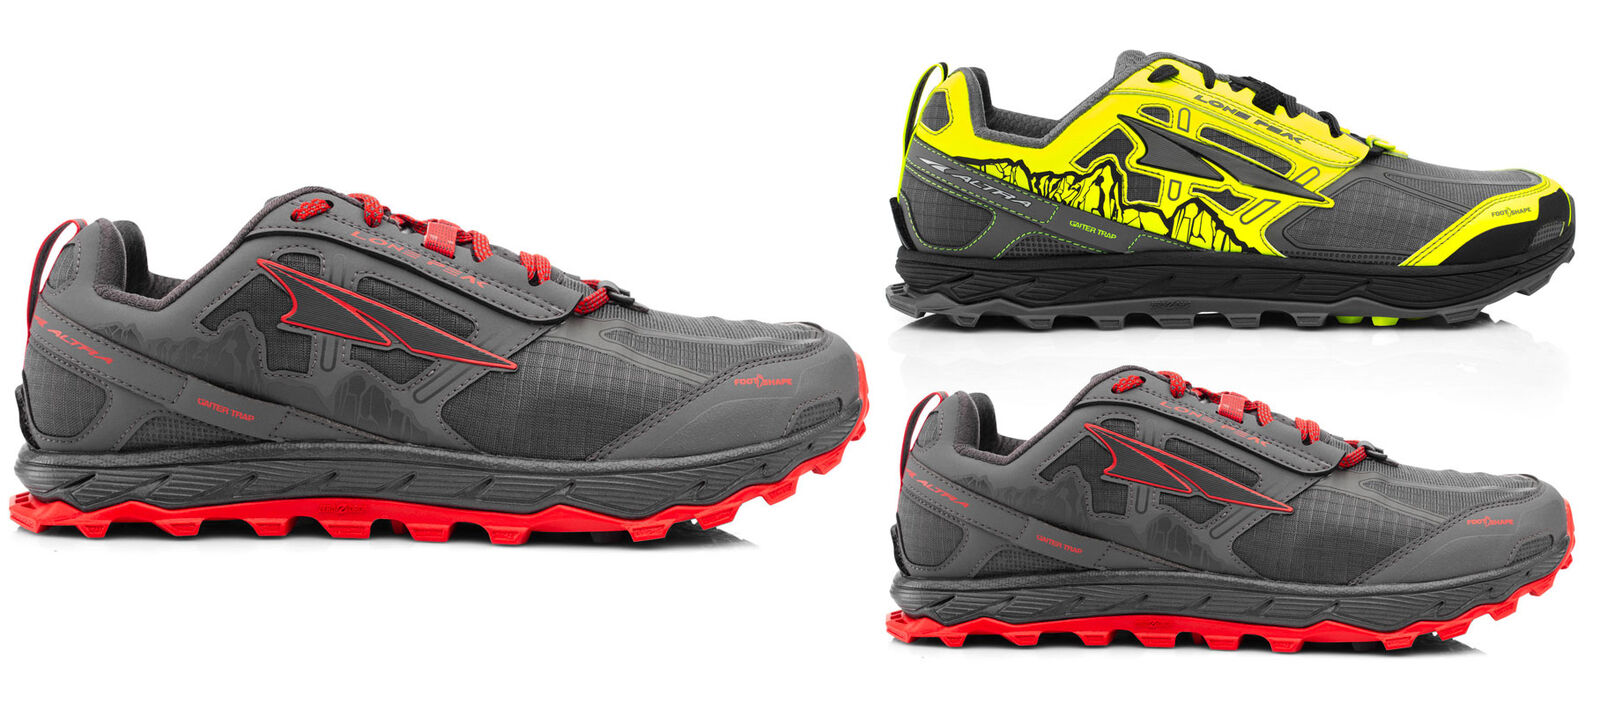 Altra AFM1855F Men's Lone Peak 4.0 shoes